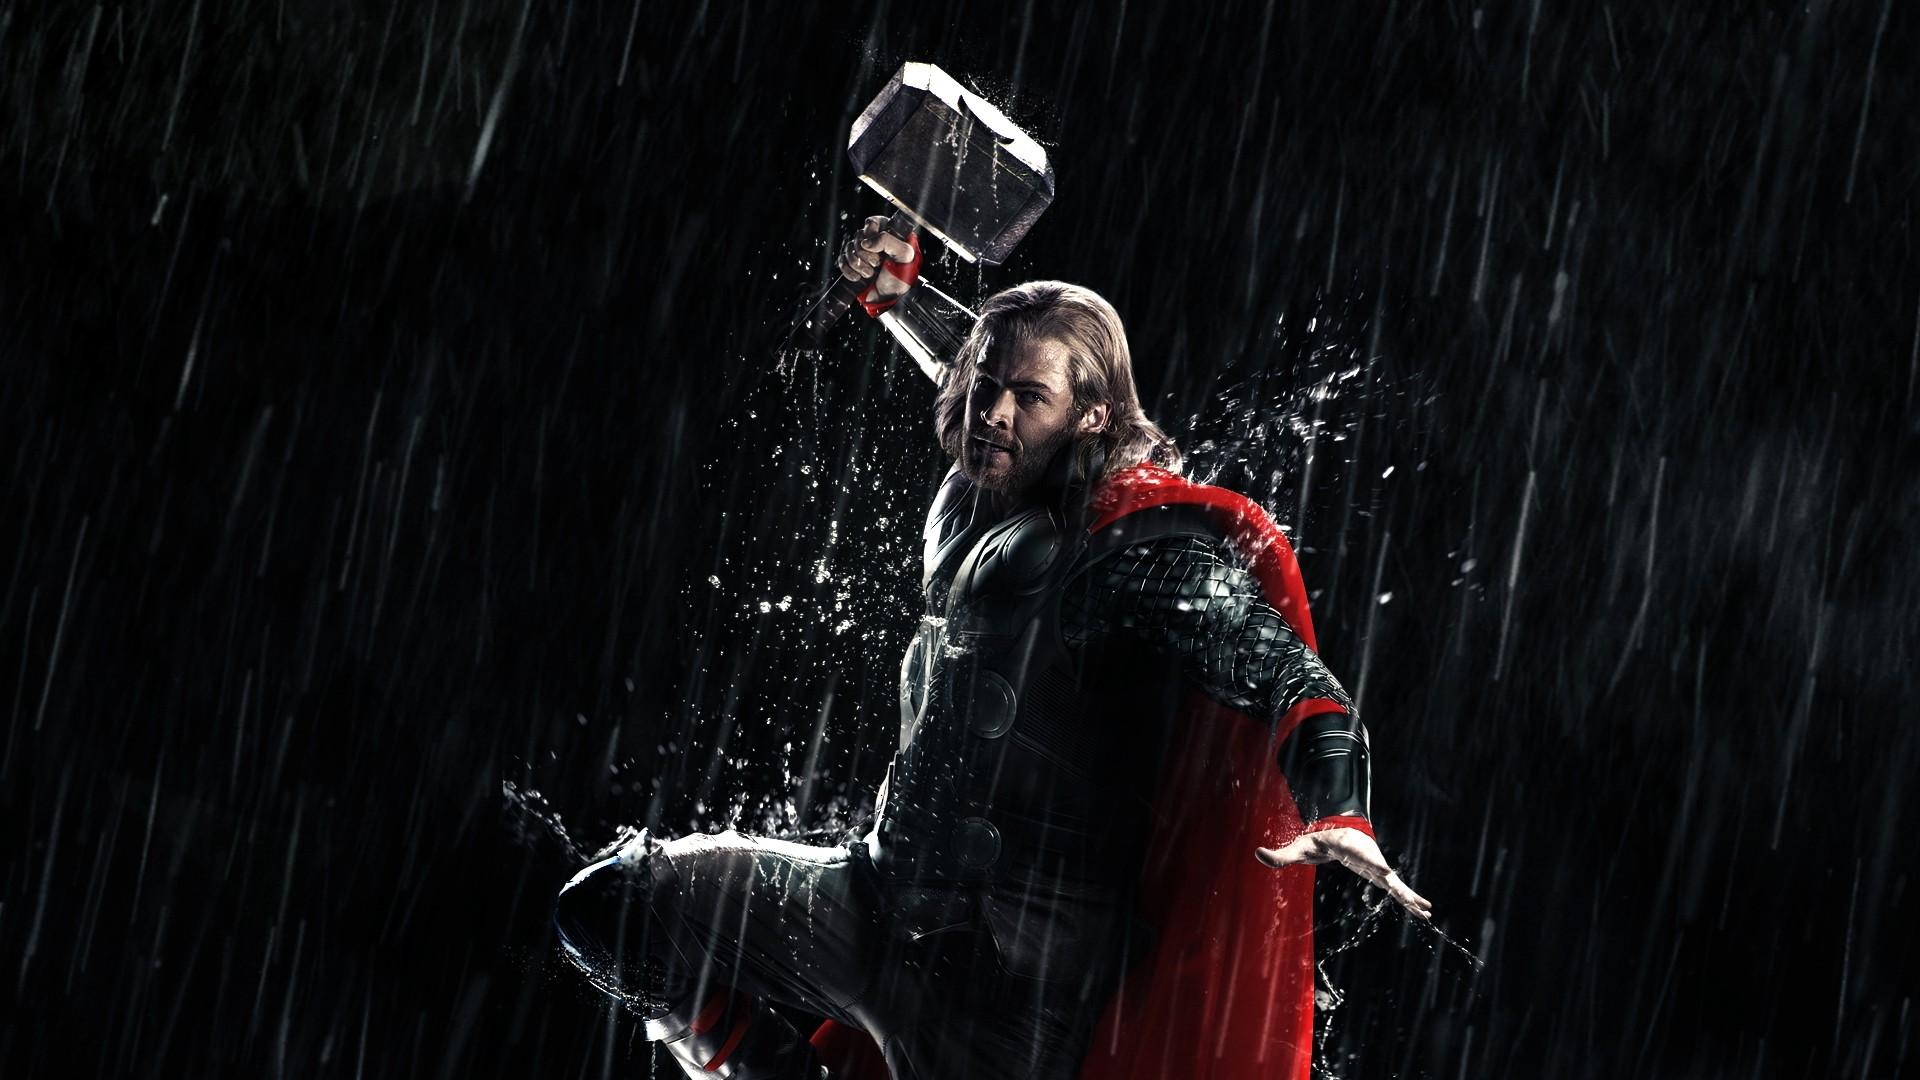 Free Thor Wallpaper HD for Desktop (36)